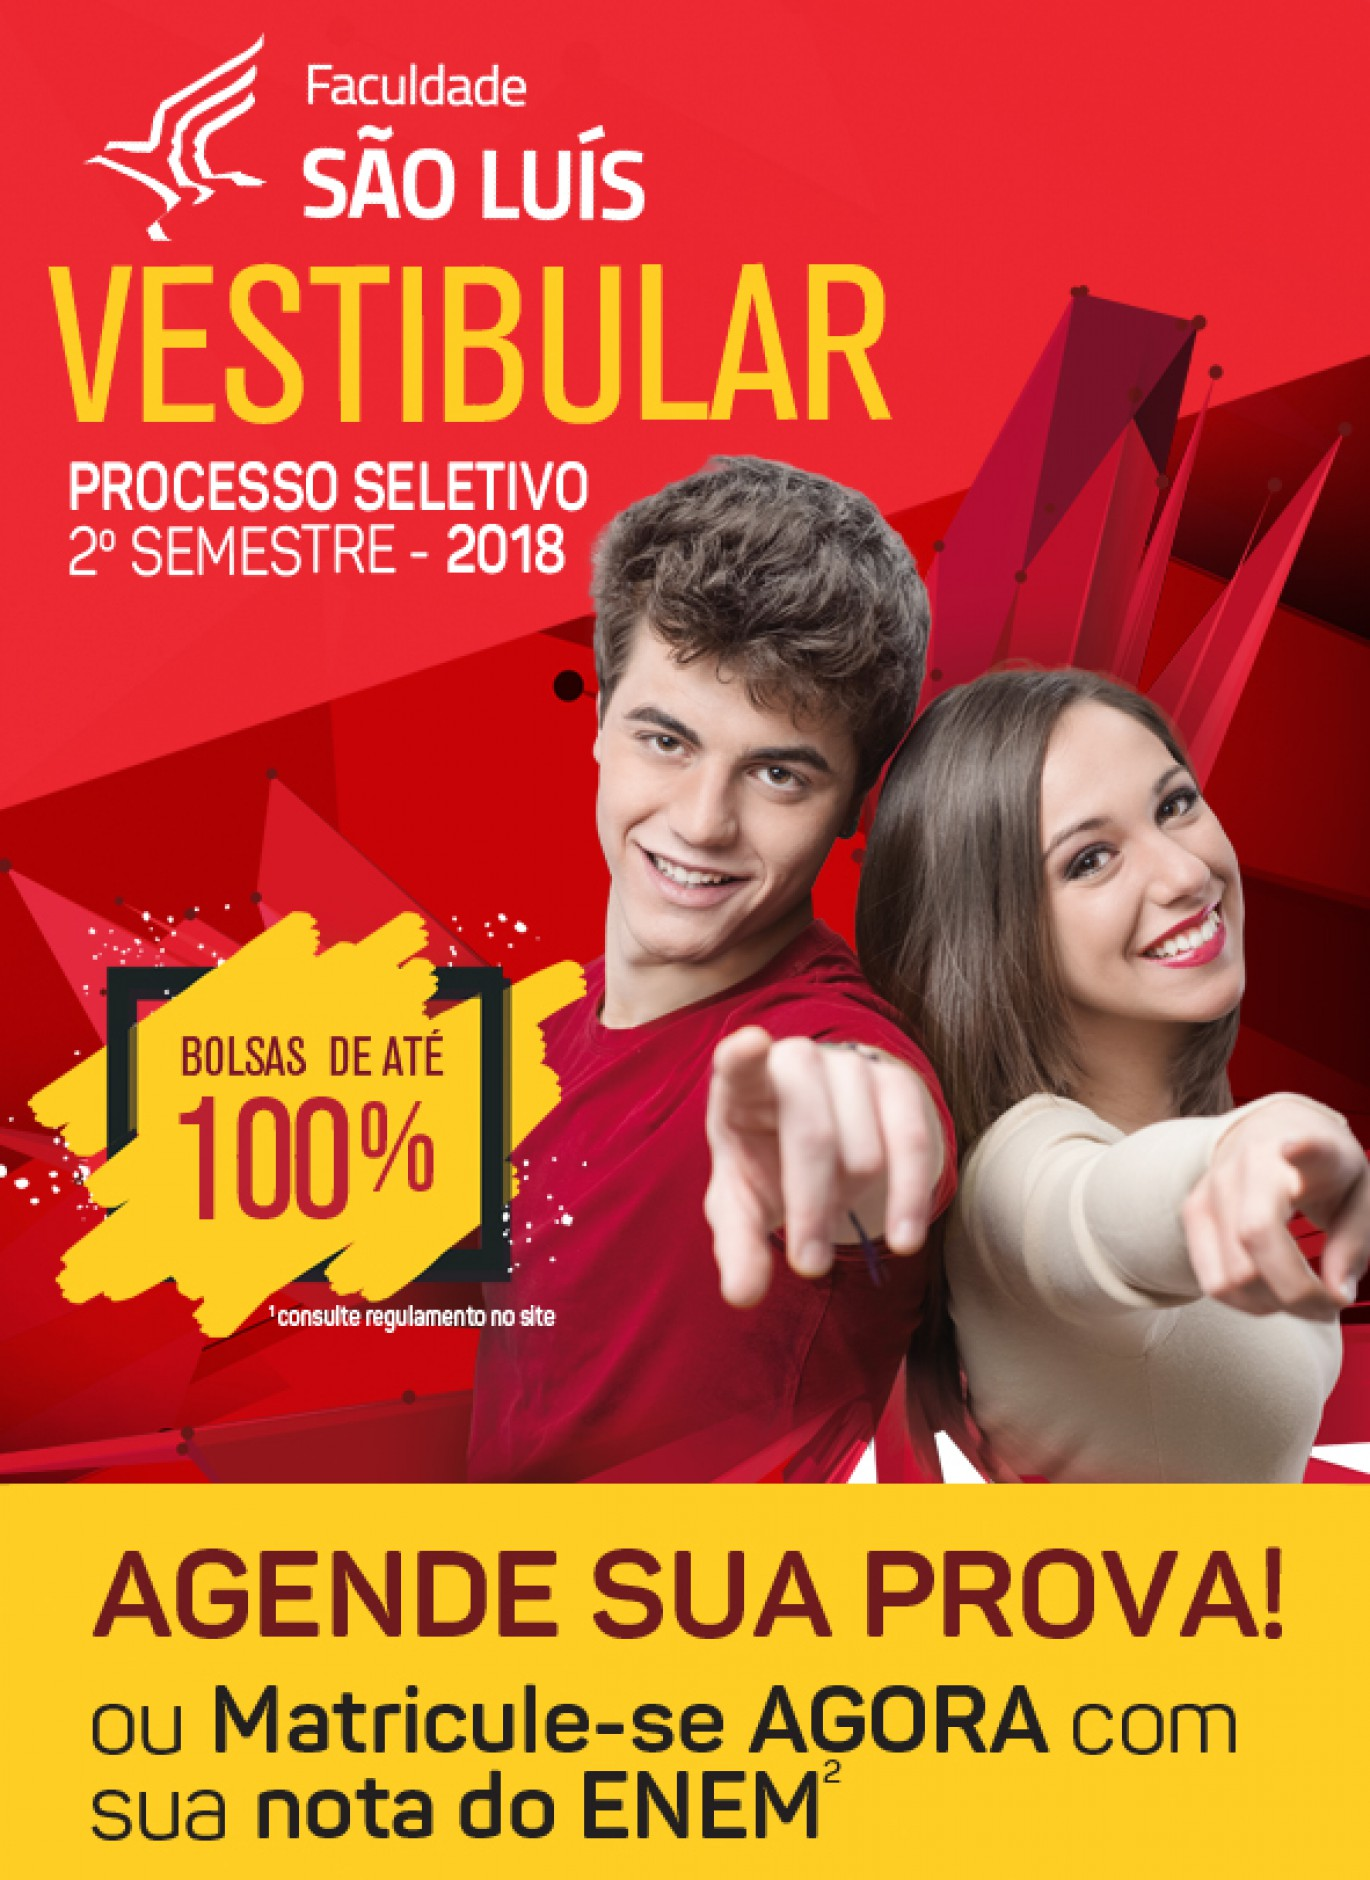 Vestibular 2018 - 2º Semestre - PROVA AGENDADA